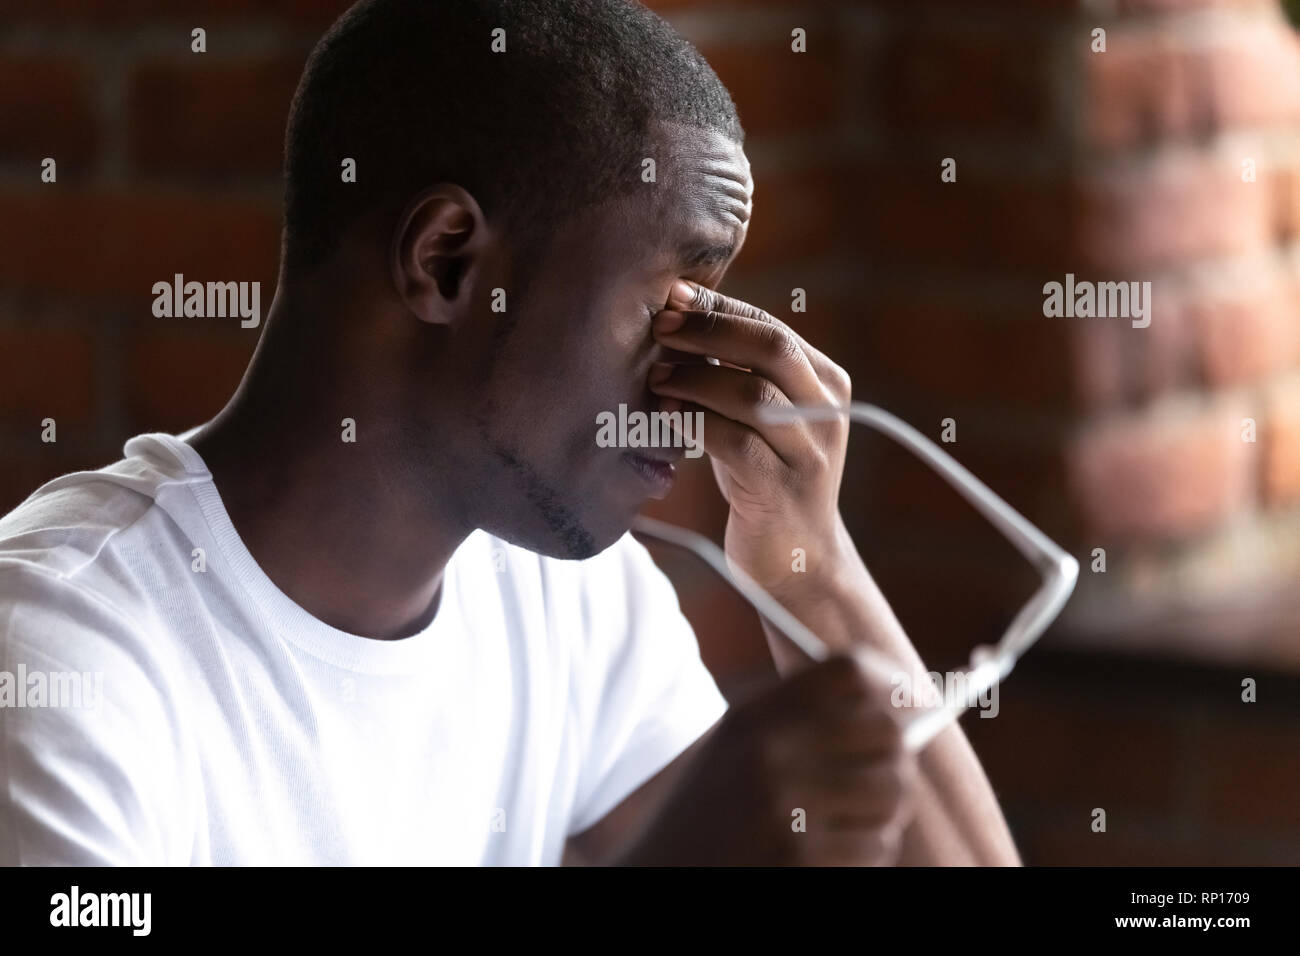 Close up black students take off glasses massaging eyes Stock Photo